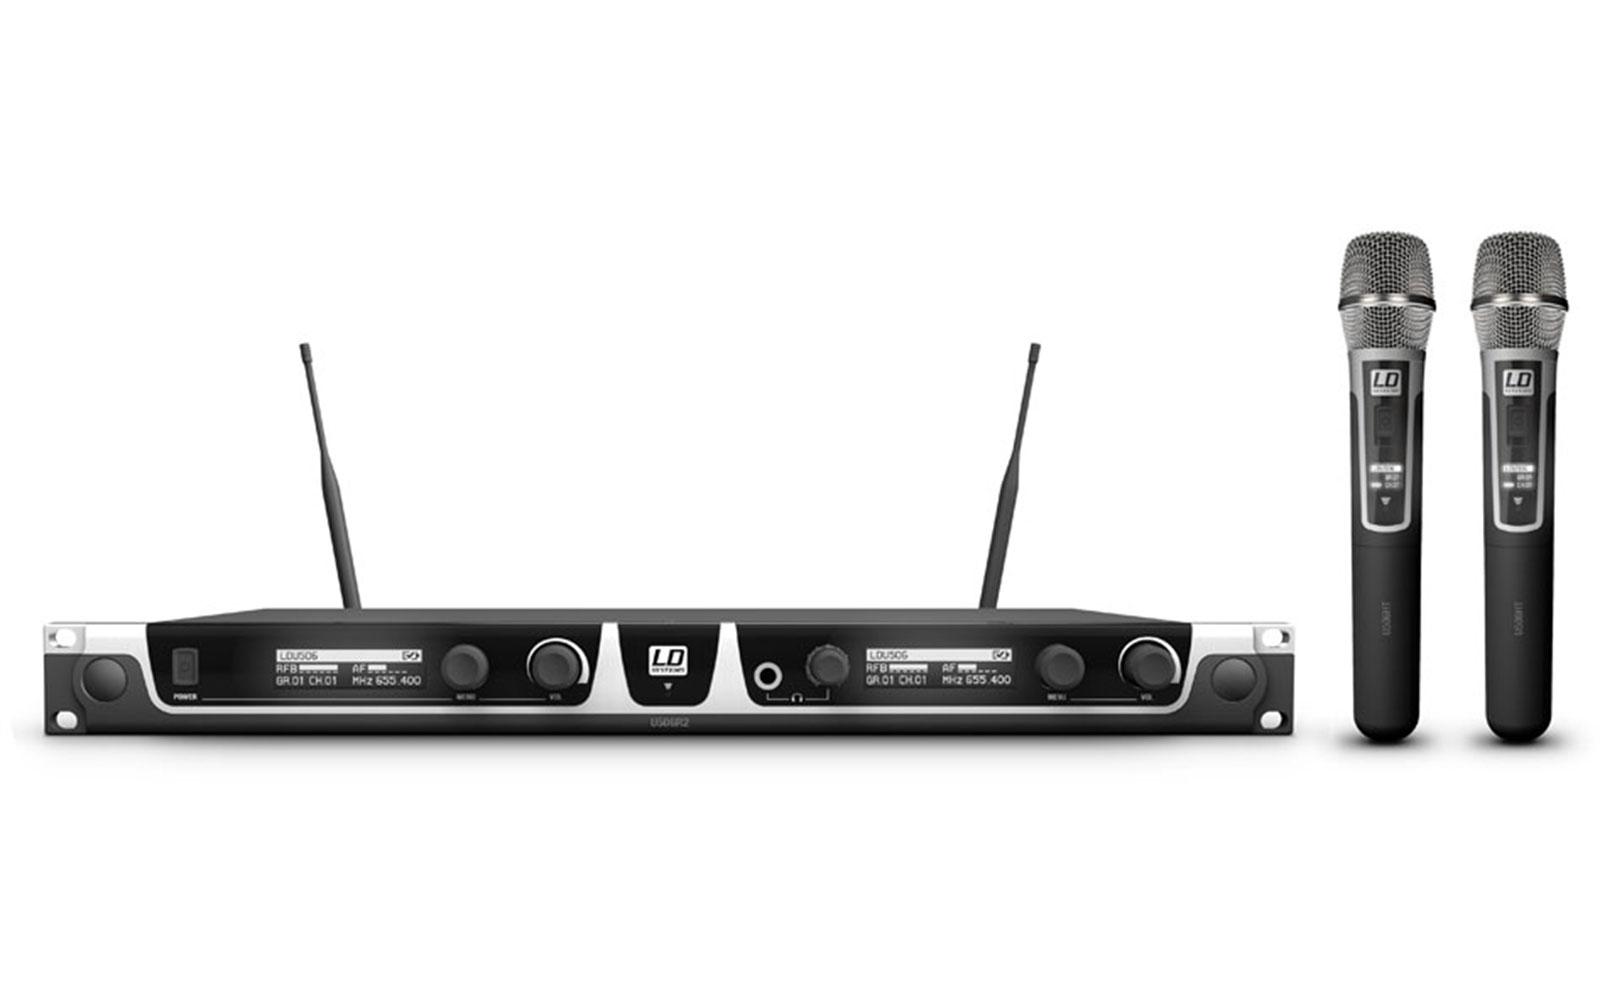 ld-systems-u506-hhc-2-funkmikrofon-system-mit-2-x-handmikrofon-kondensator